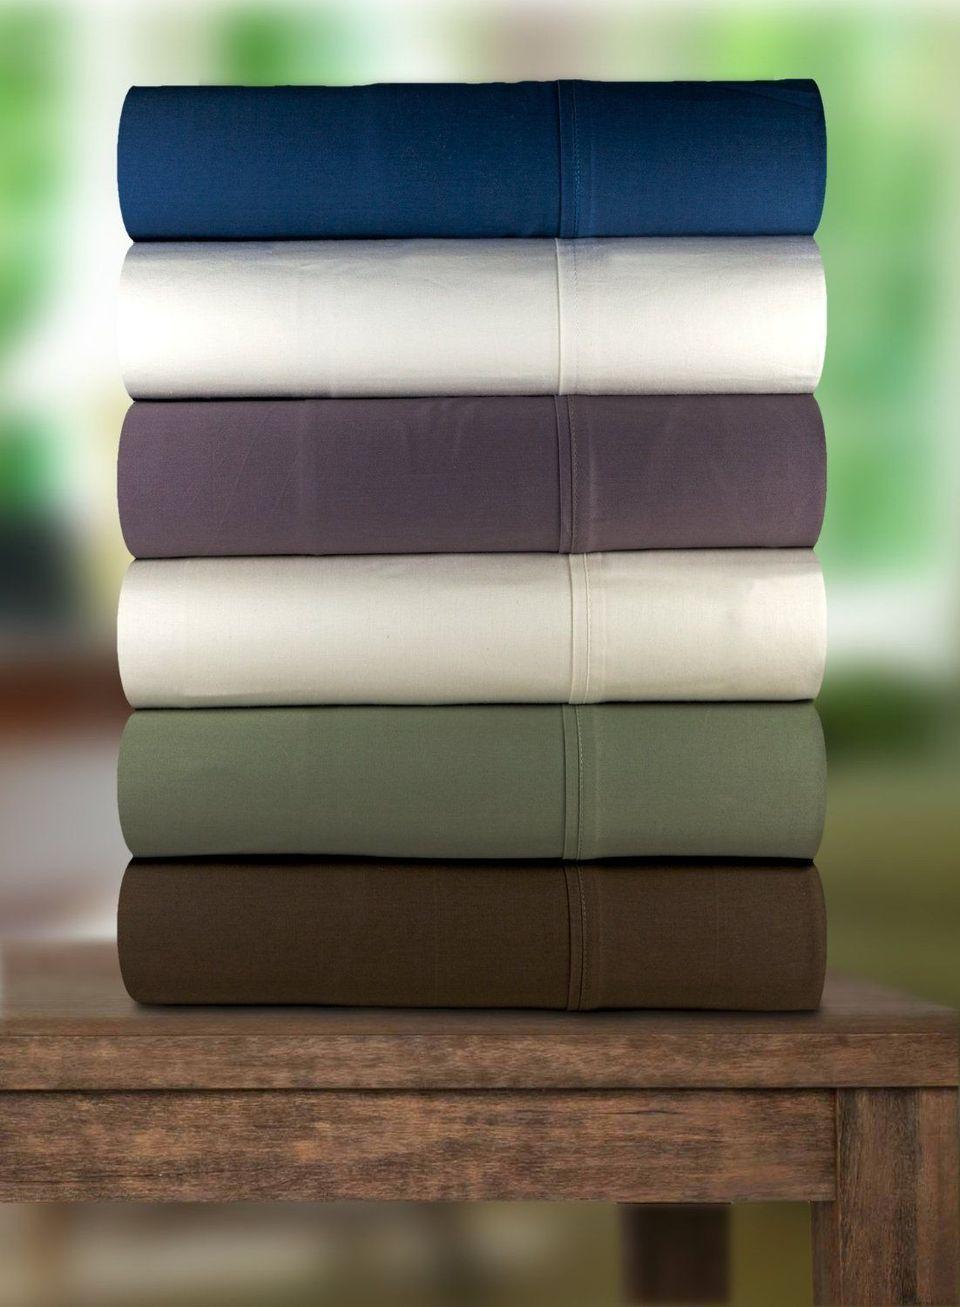 Magnolia Organics Dream Collection Sheet Set, 300 Thread Count - Queen, Natural